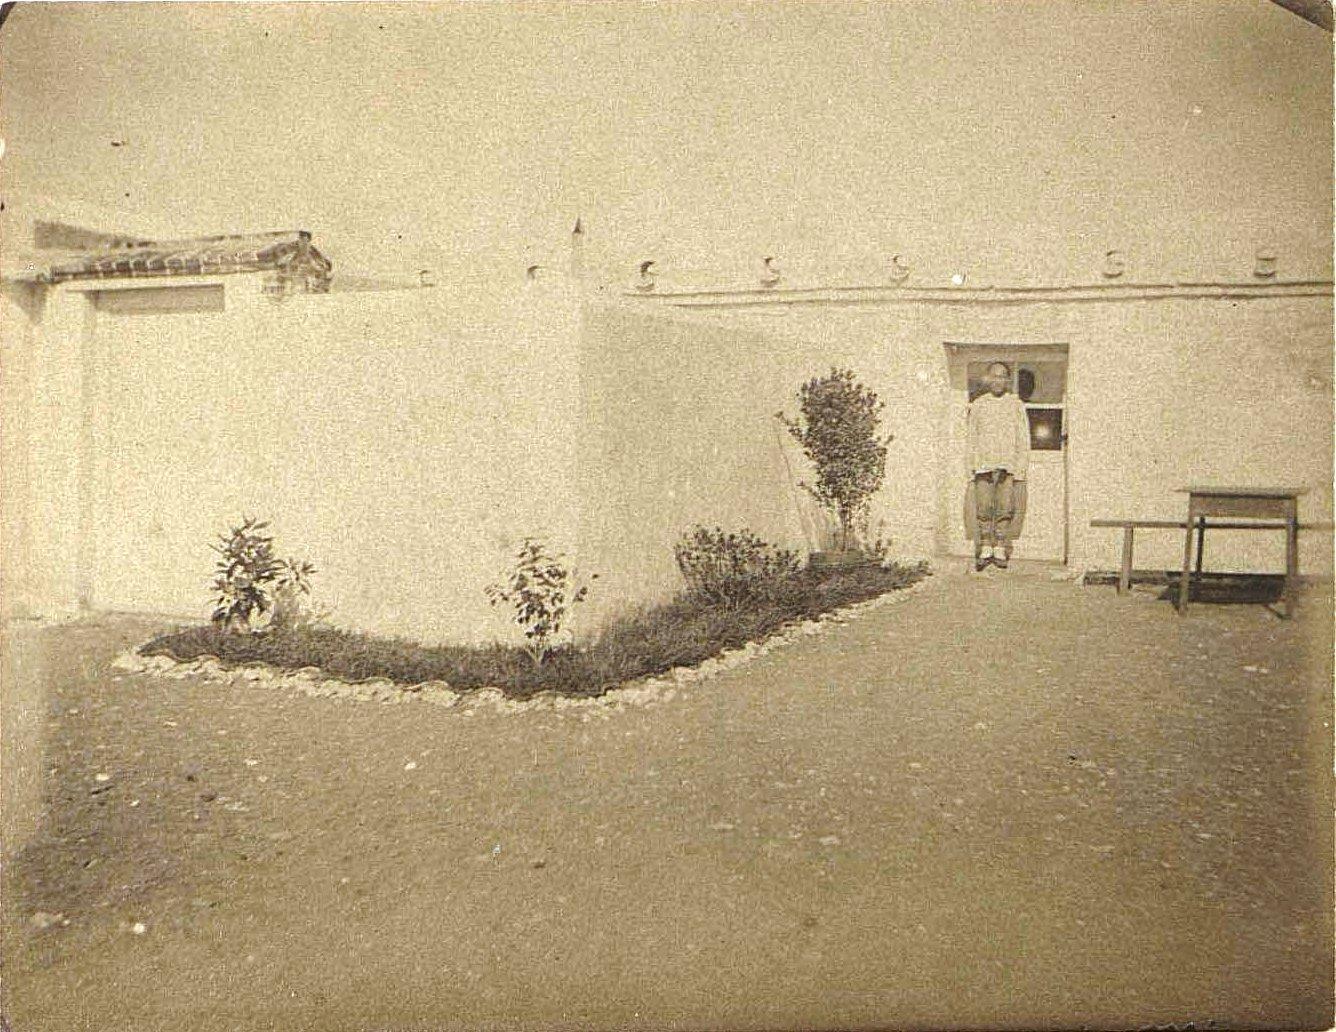 1898. Китай, г. Талиенван. «Ванька» (китаец) в Талиенванском морском собрании. Август